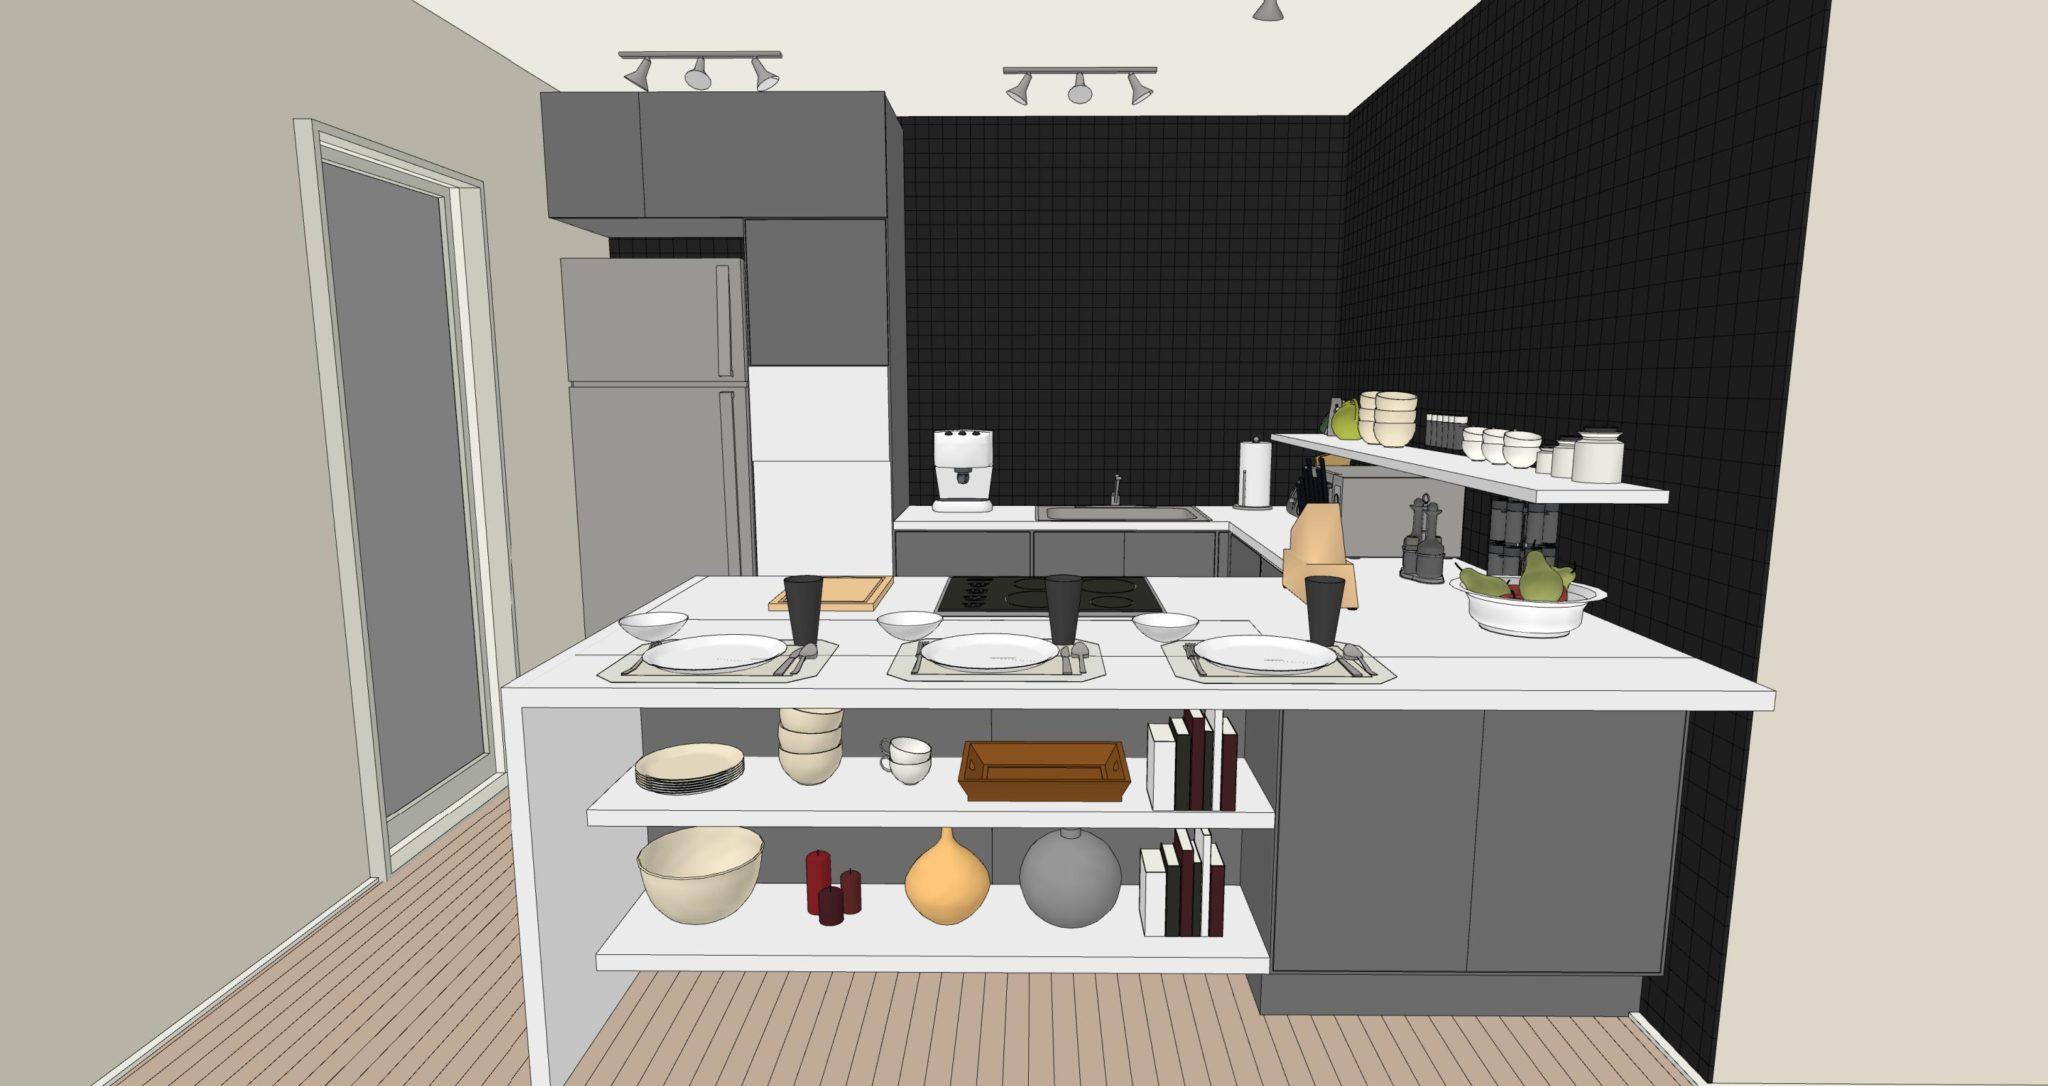 Pensili cucina in muratura idee per la decorazione di for Pensili cucina in muratura